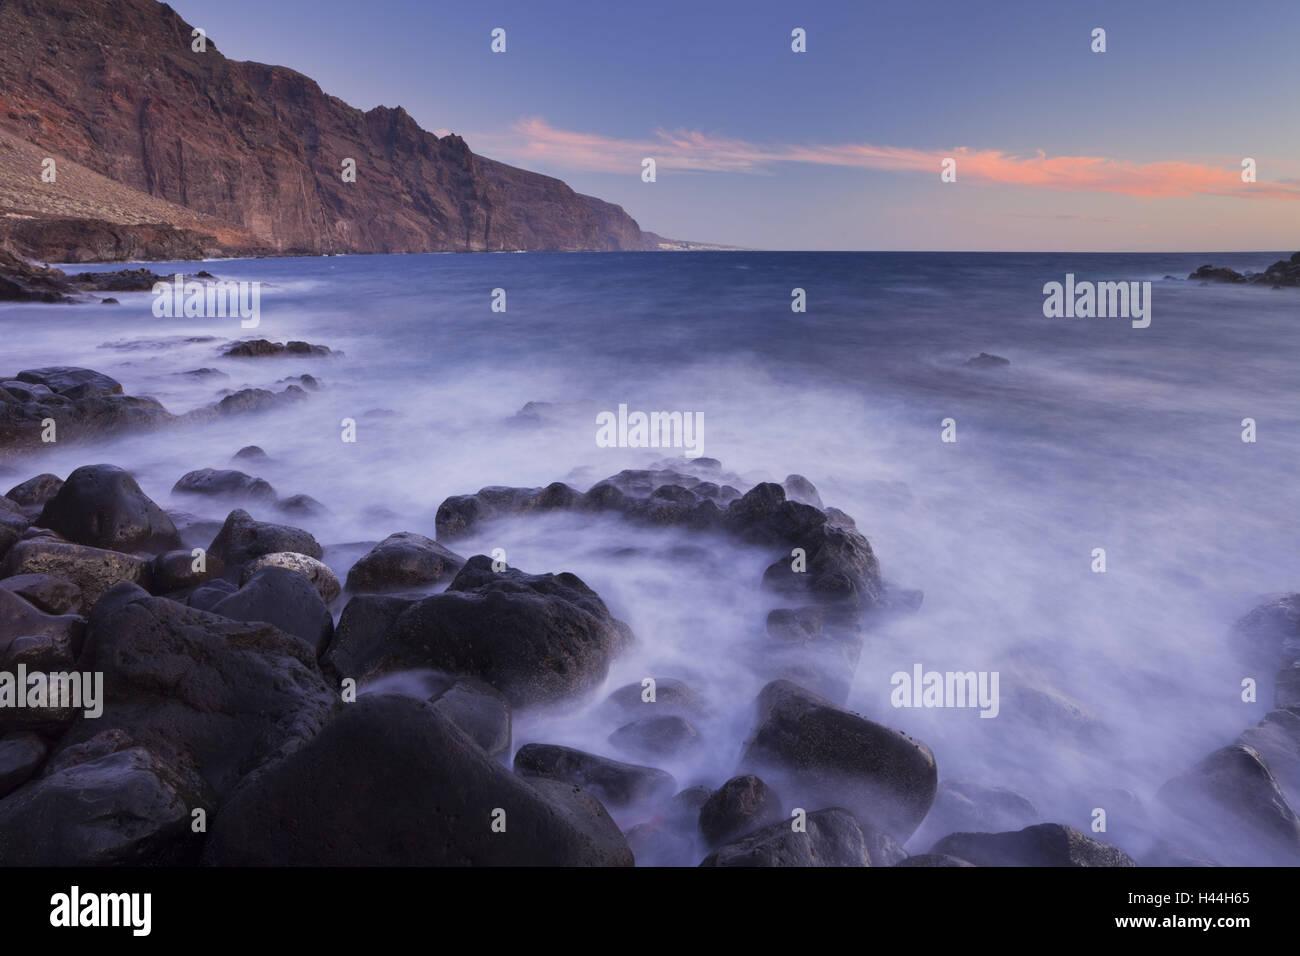 Spanien, Kanarische Inseln, Teneriffa, Punta Tu Teno, Batch Gigantes, Surfen, Stockbild